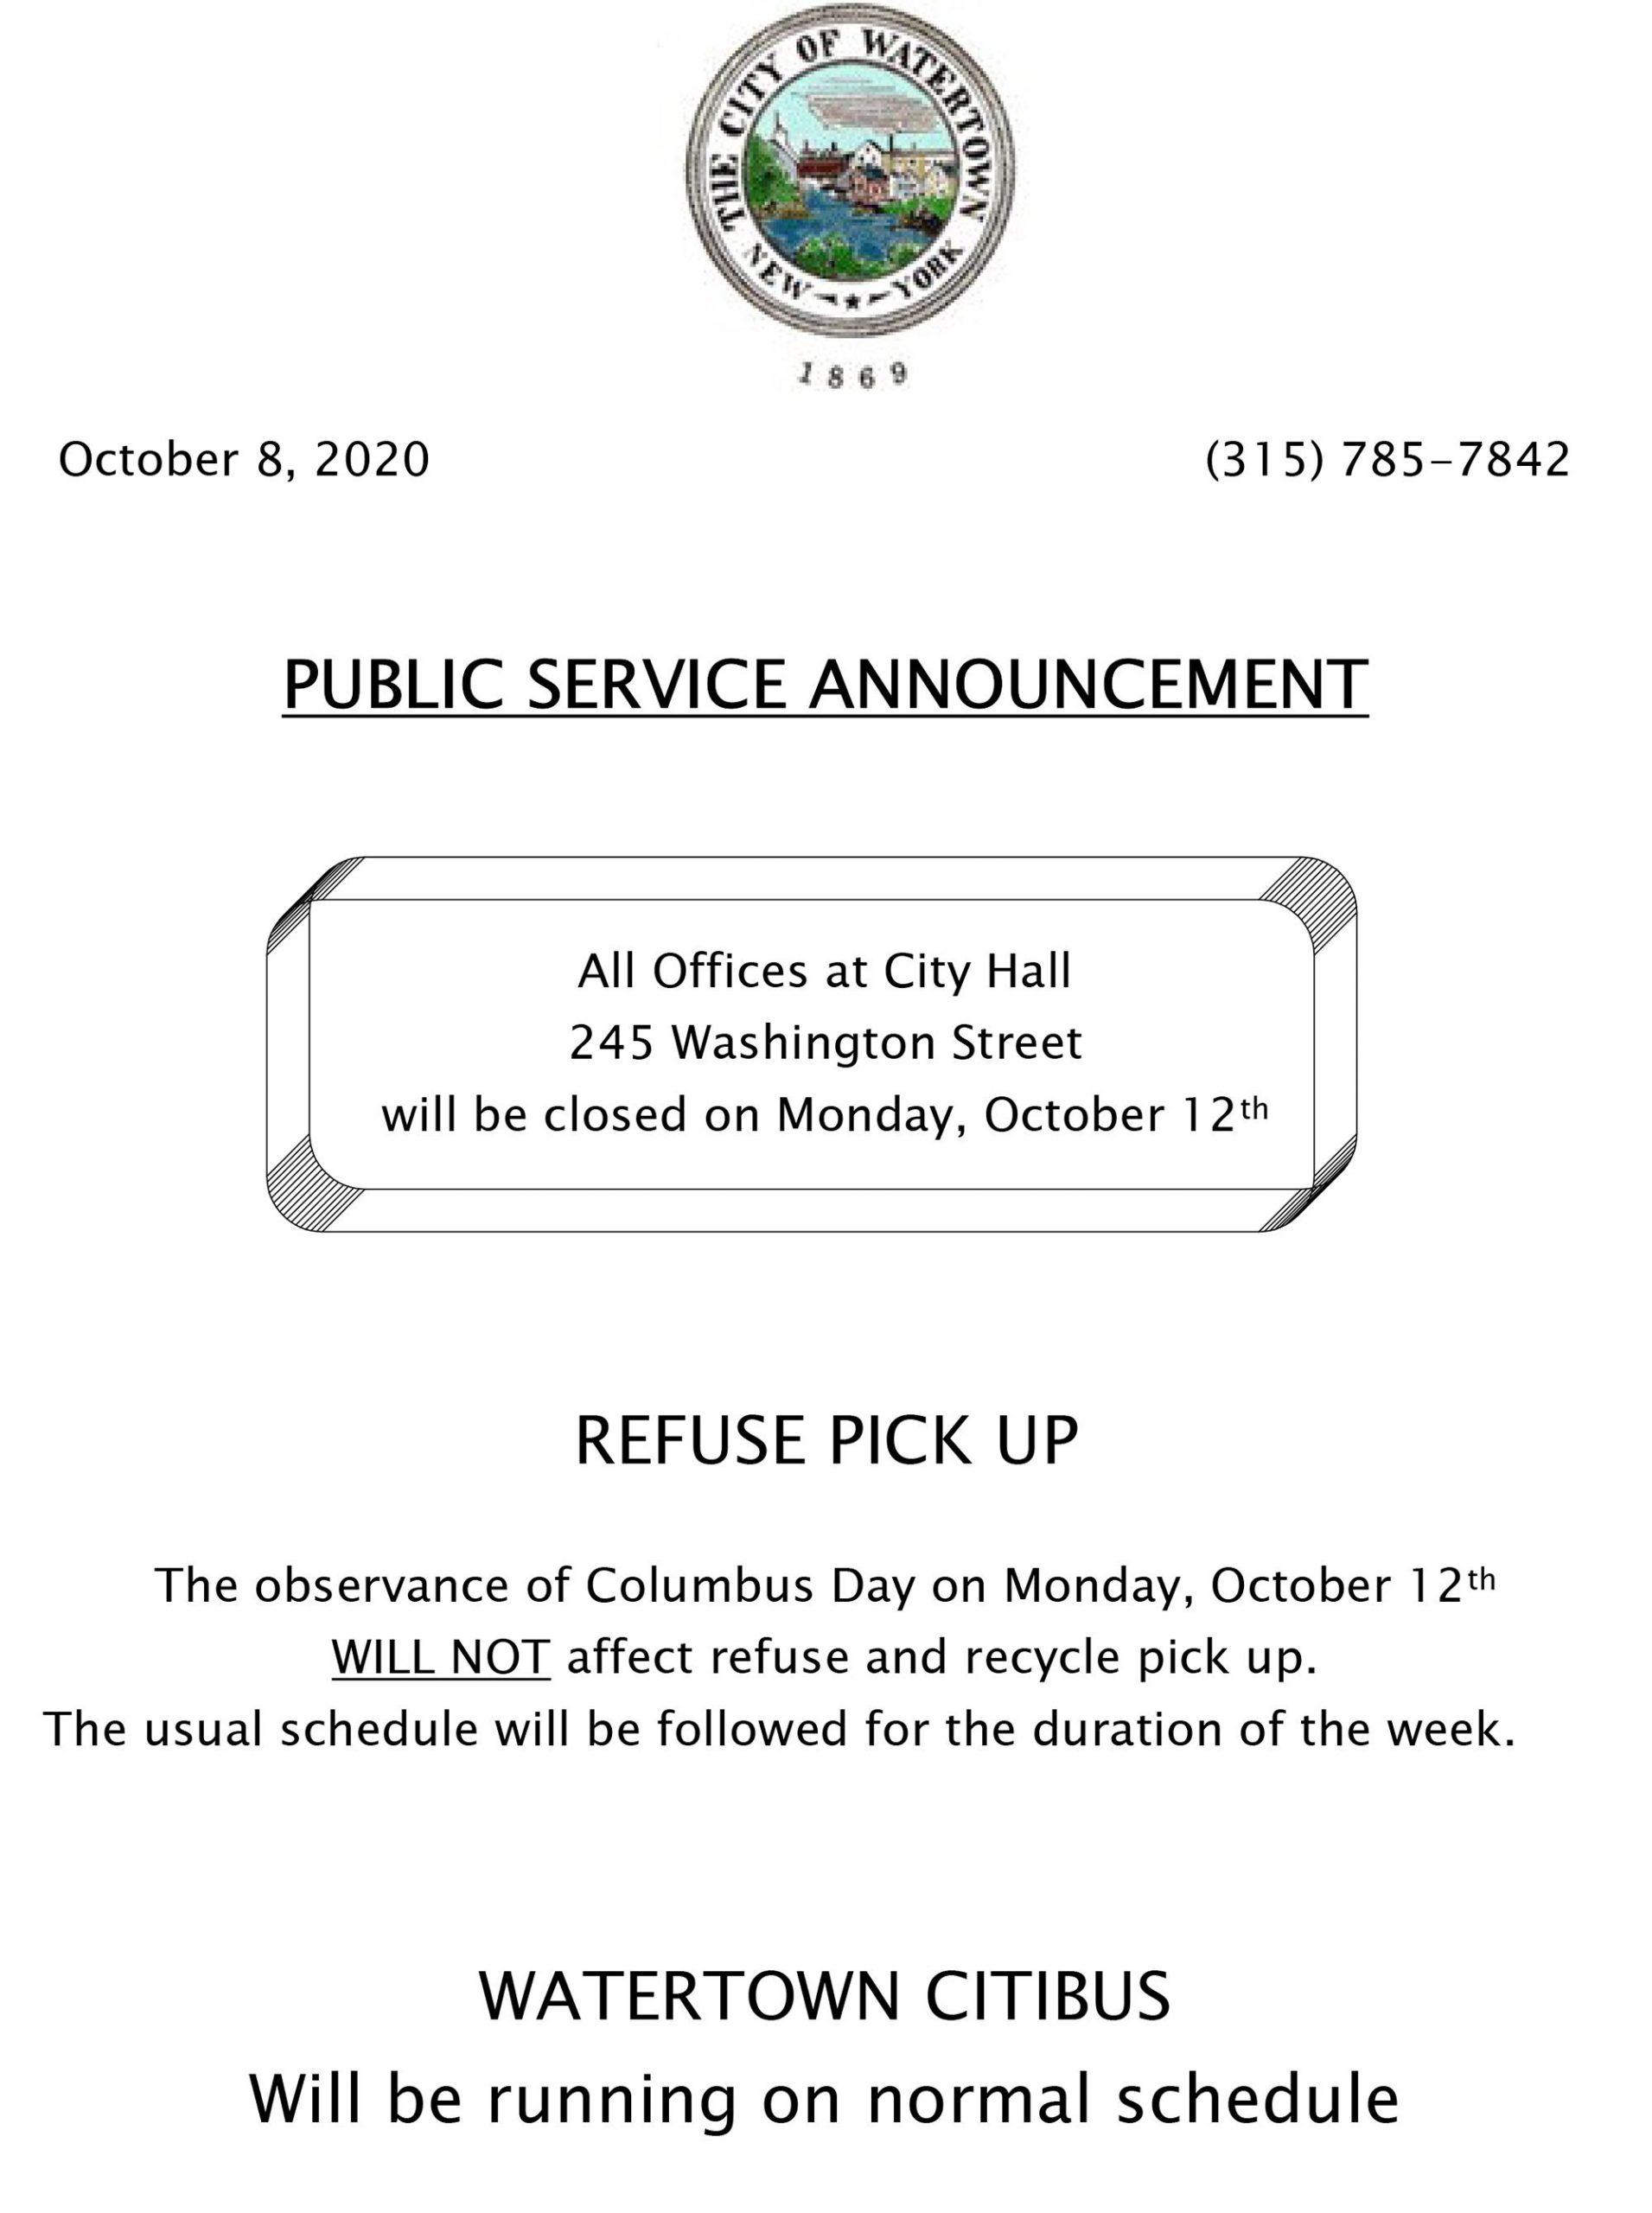 City Of Watertown Columbus Day 2020 Schedule | Newzjunky